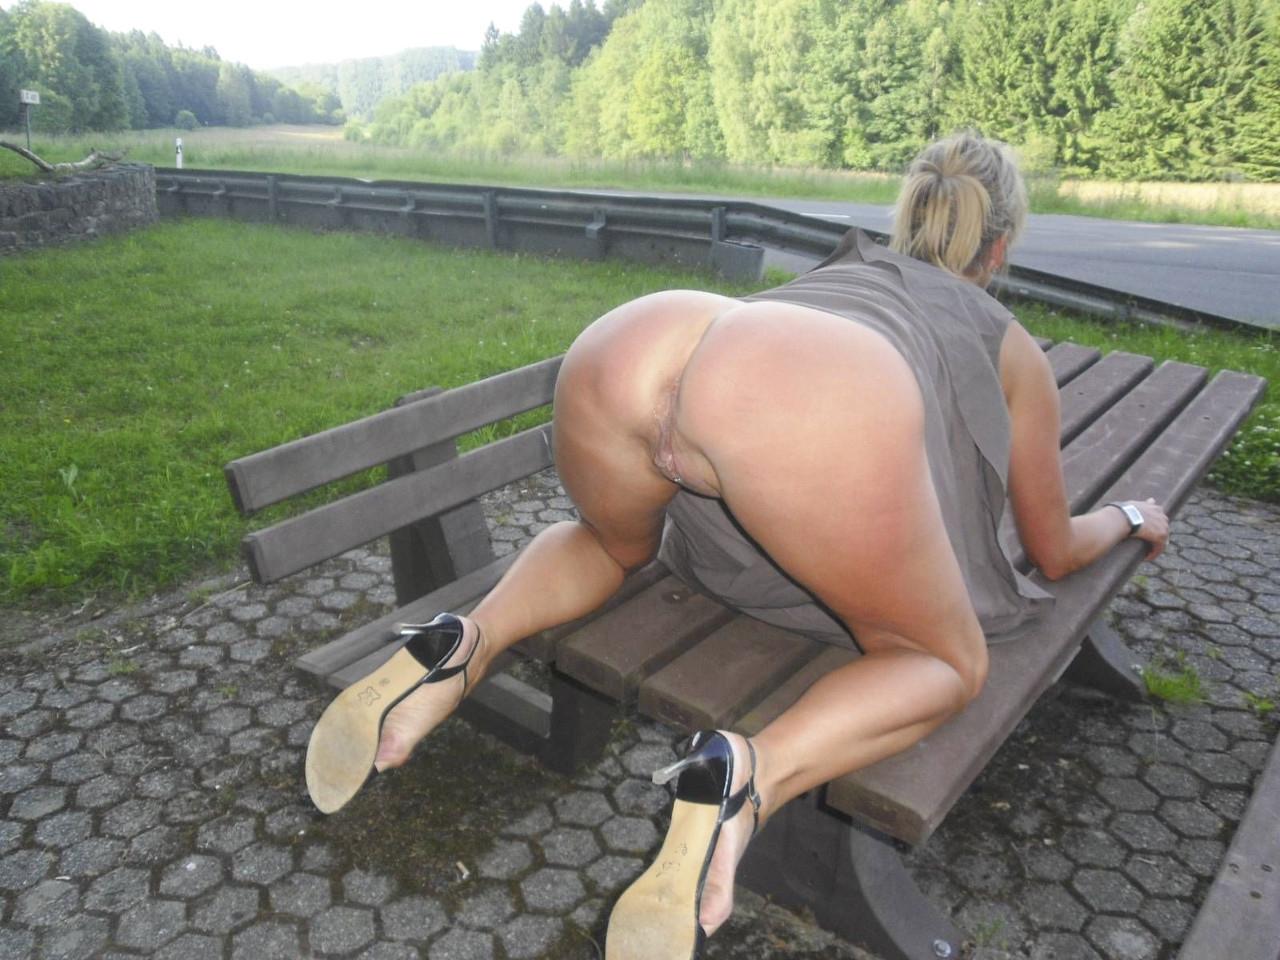 Nude women in dirty bondage